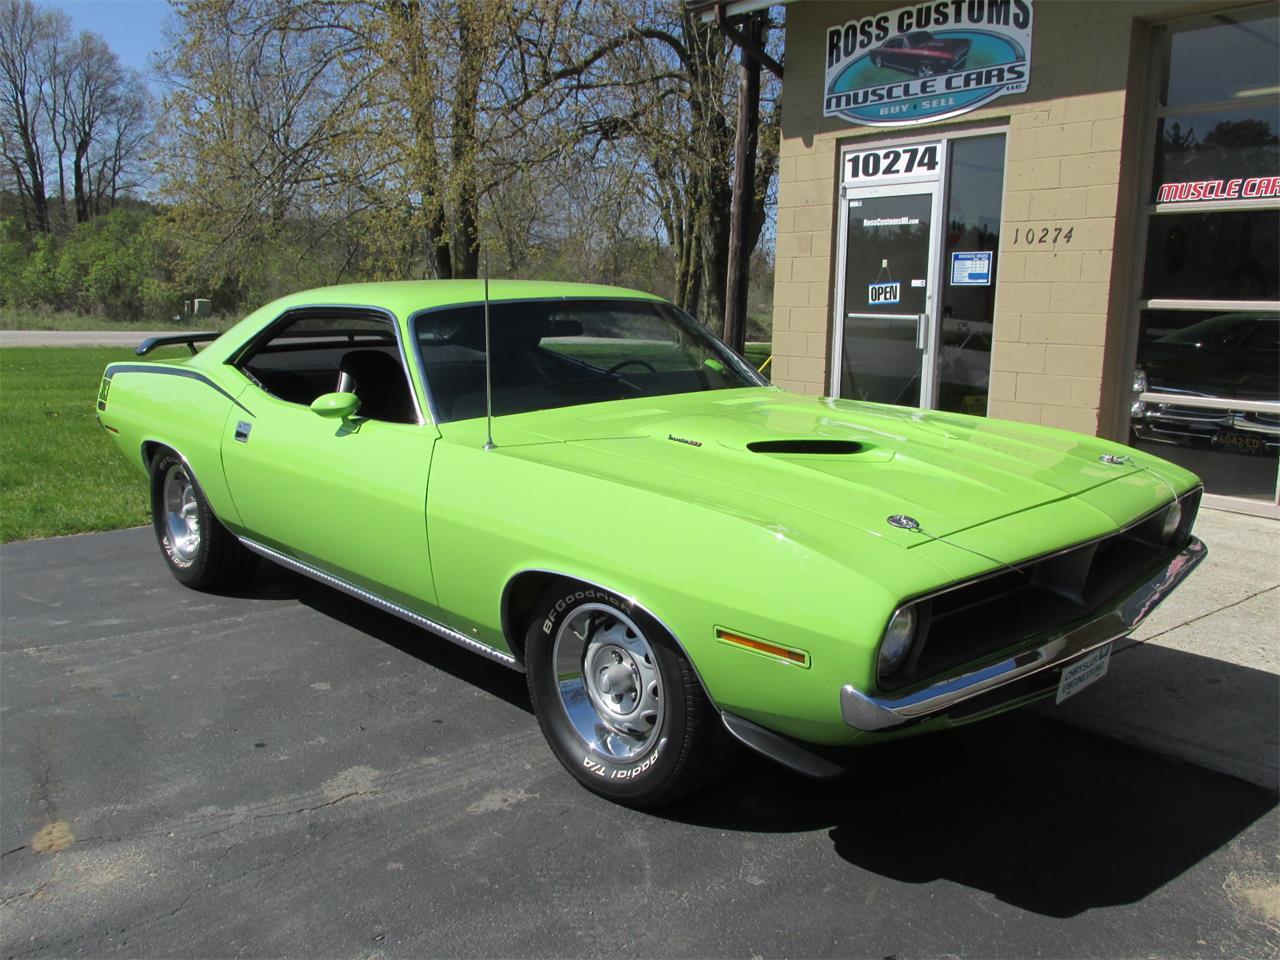 Large Picture of '70 Cuda located in Goodrich Michigan - $43,900.00 - Q105